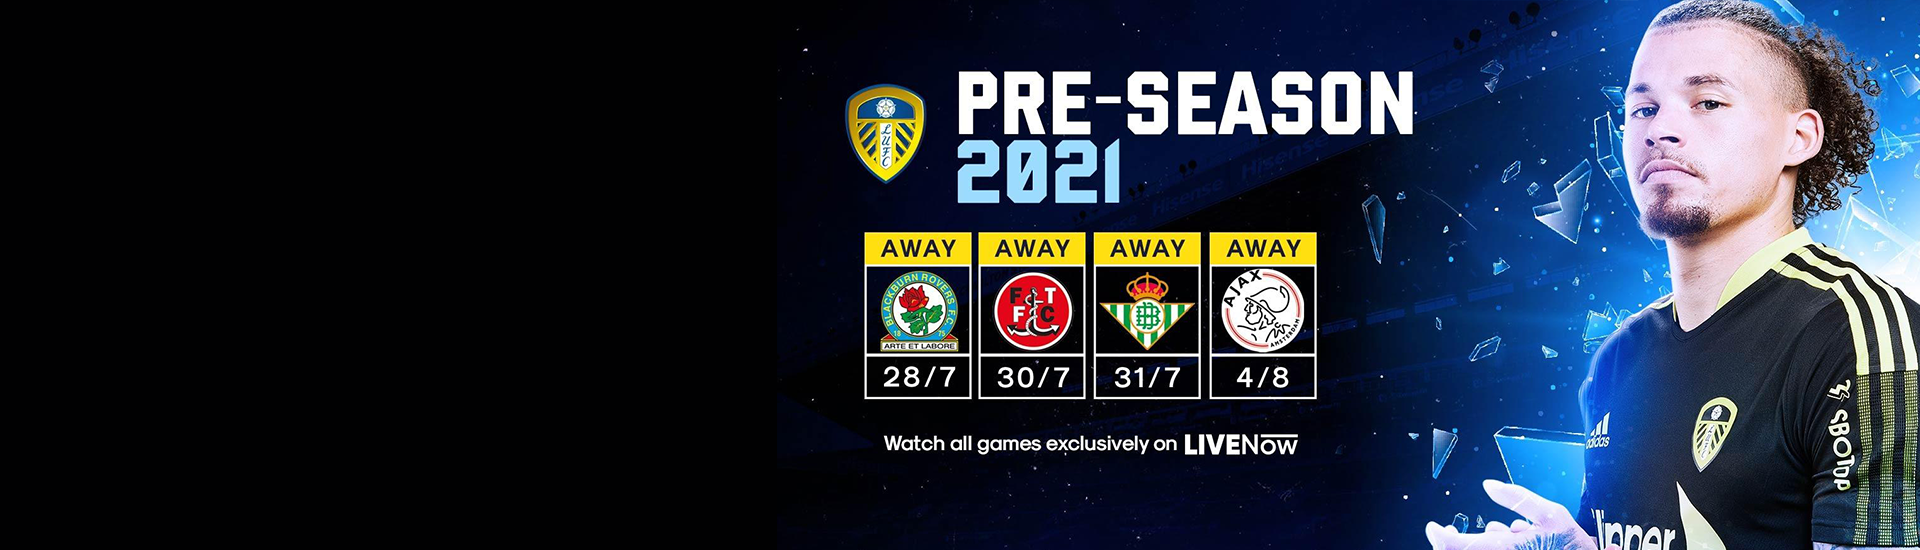 LIVENow to broadcast Leeds United pre-season games